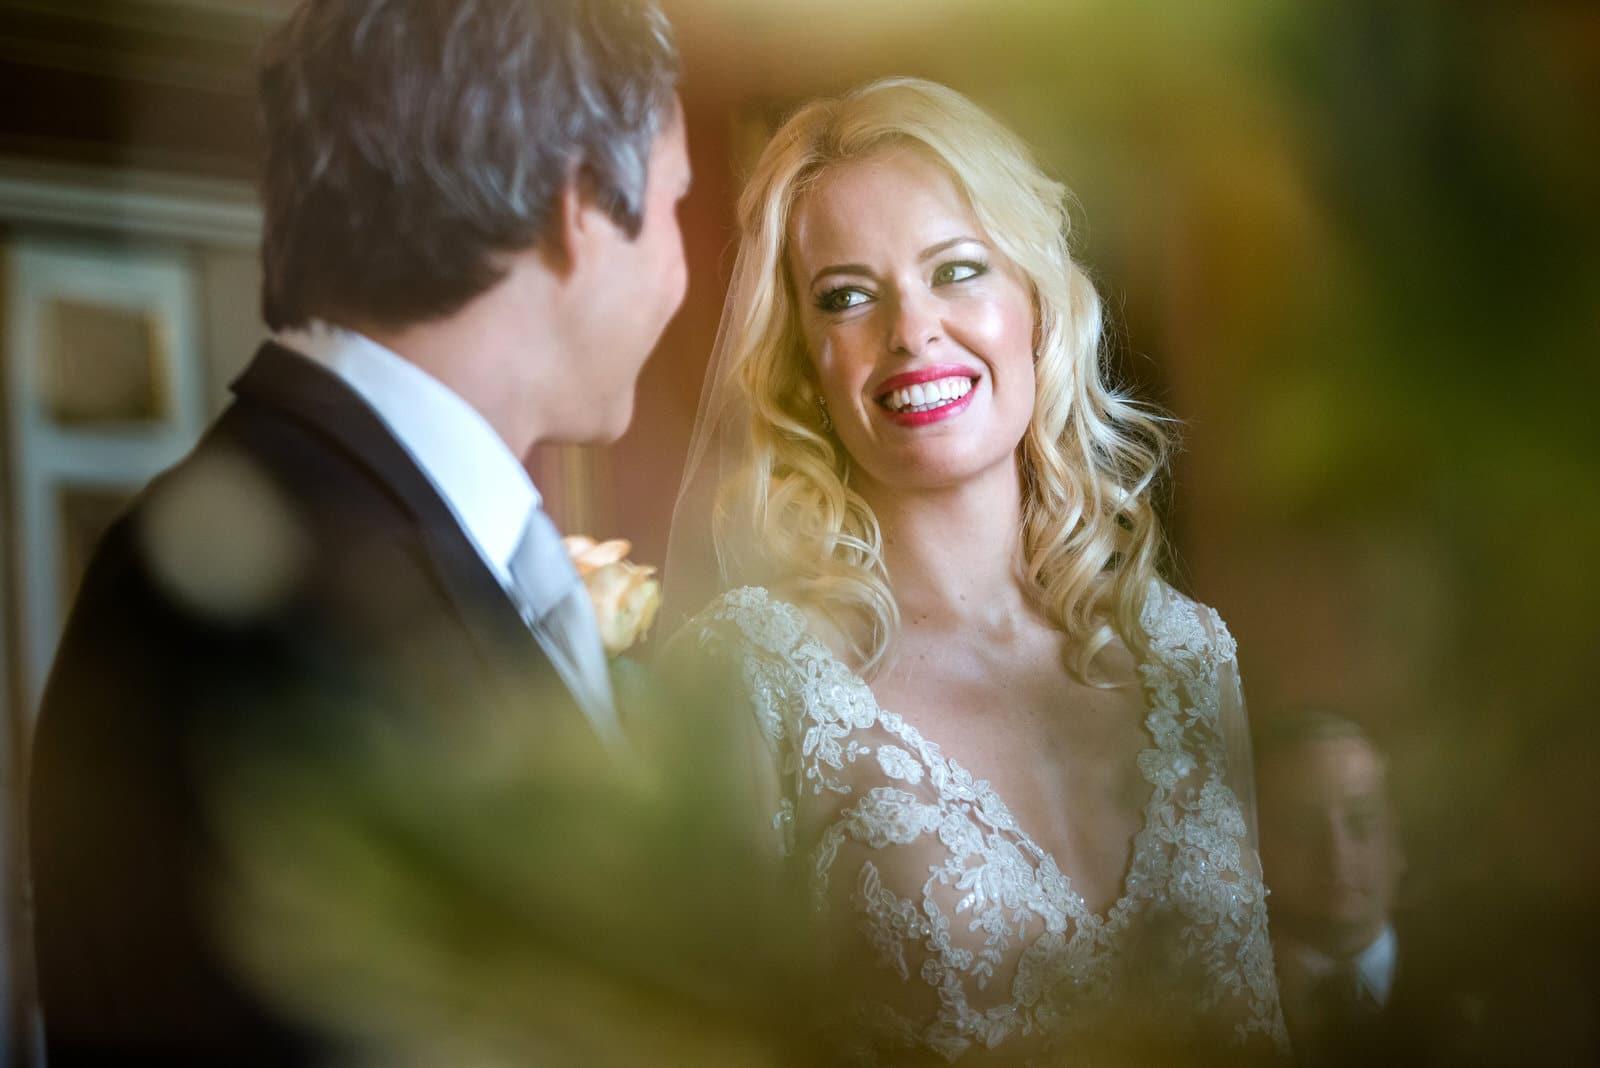 wedding ceremony bride looking happy and in love